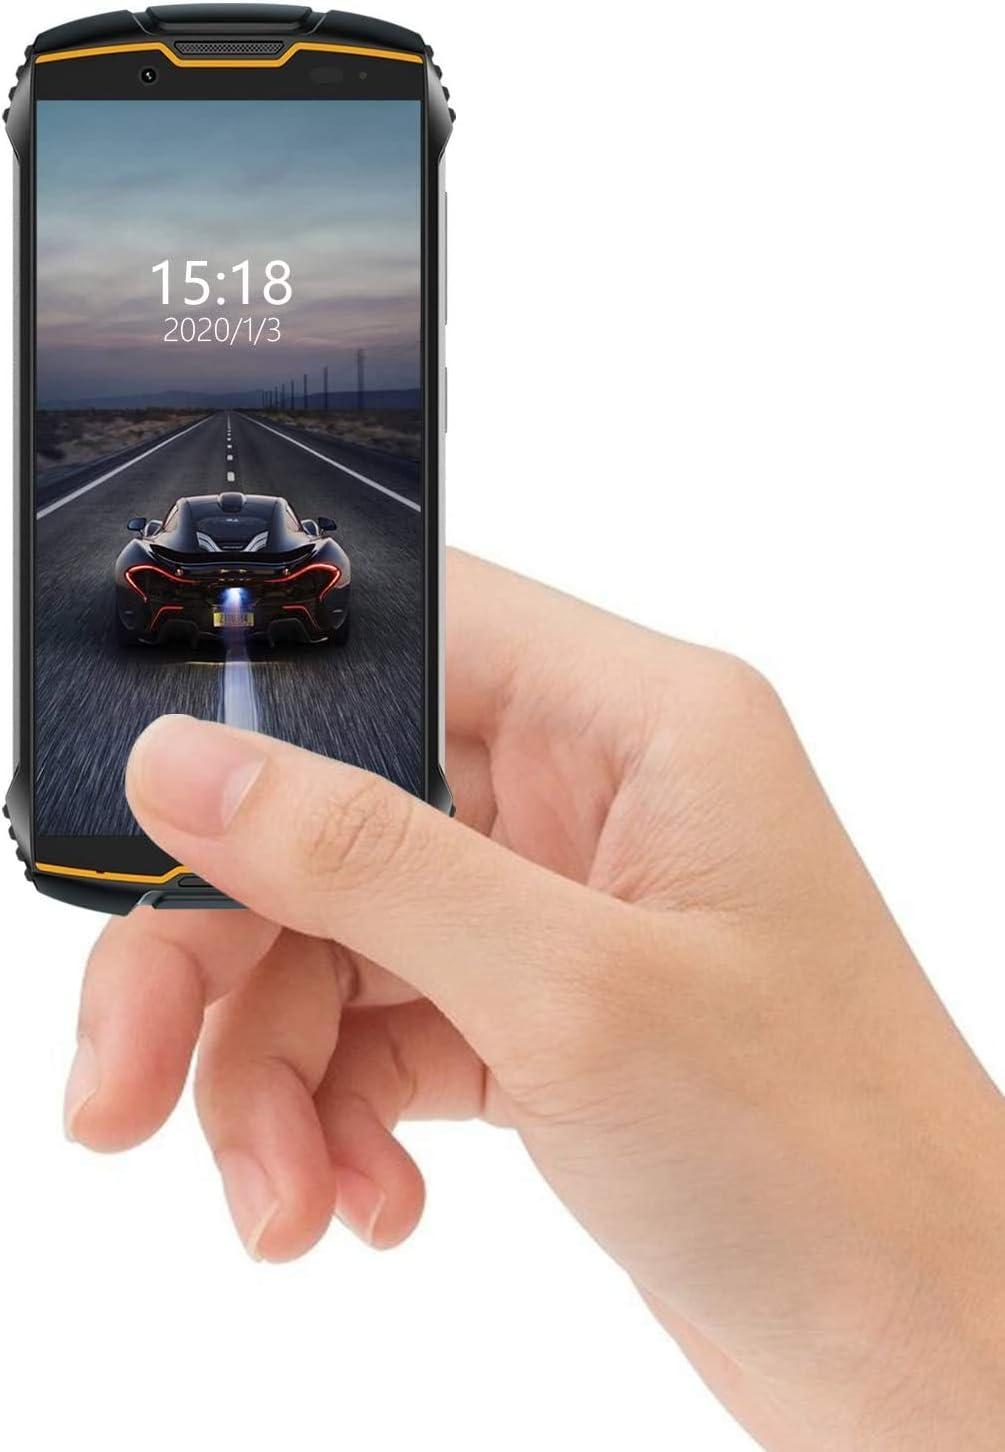 CUBOT King Kong Mini 4G teléfono IP68 Móvil Libre Impermeable Smartphone 4.0 Pulgadas Android 9.0 Dual SIM Quad-Core 13,0MP Cámara 3GB+32GB Quad-Core Amarillo, Naranja: Amazon.es: Electrónica